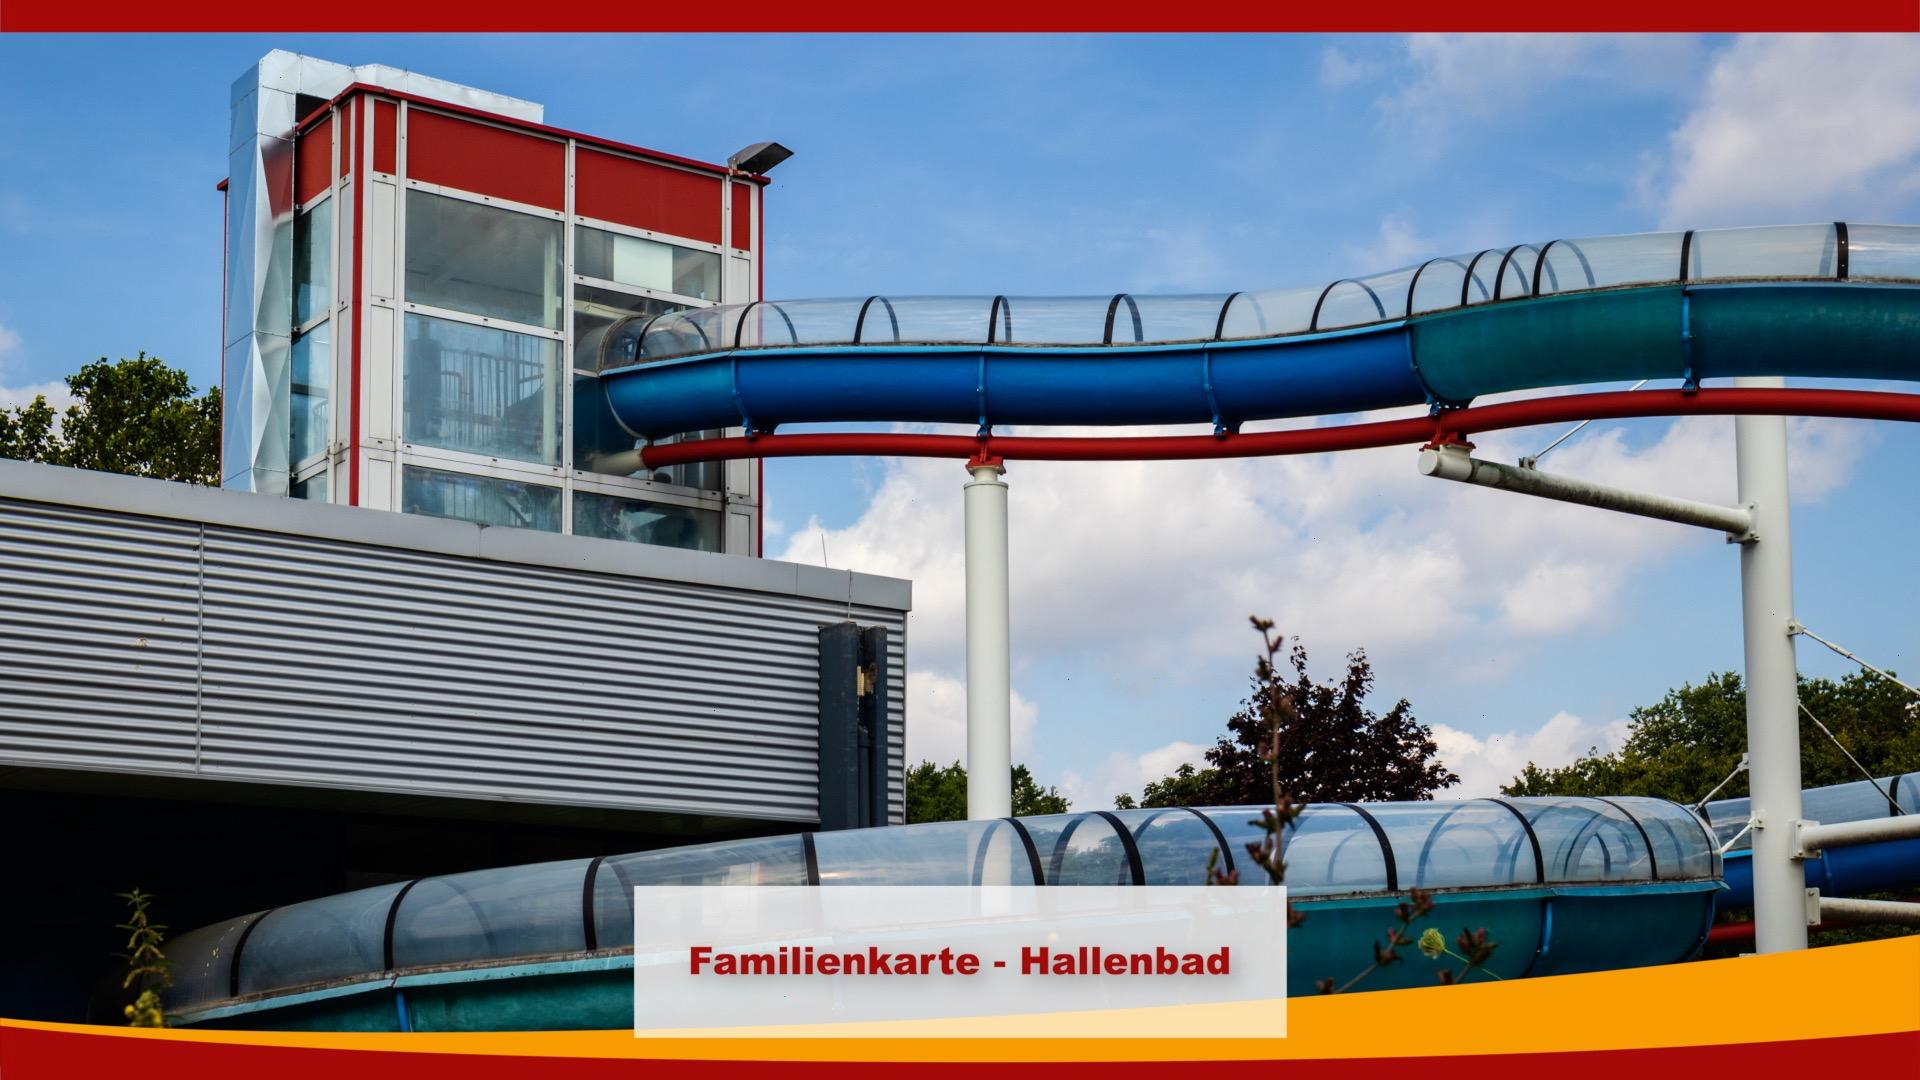 Familienkarte Hallenbad